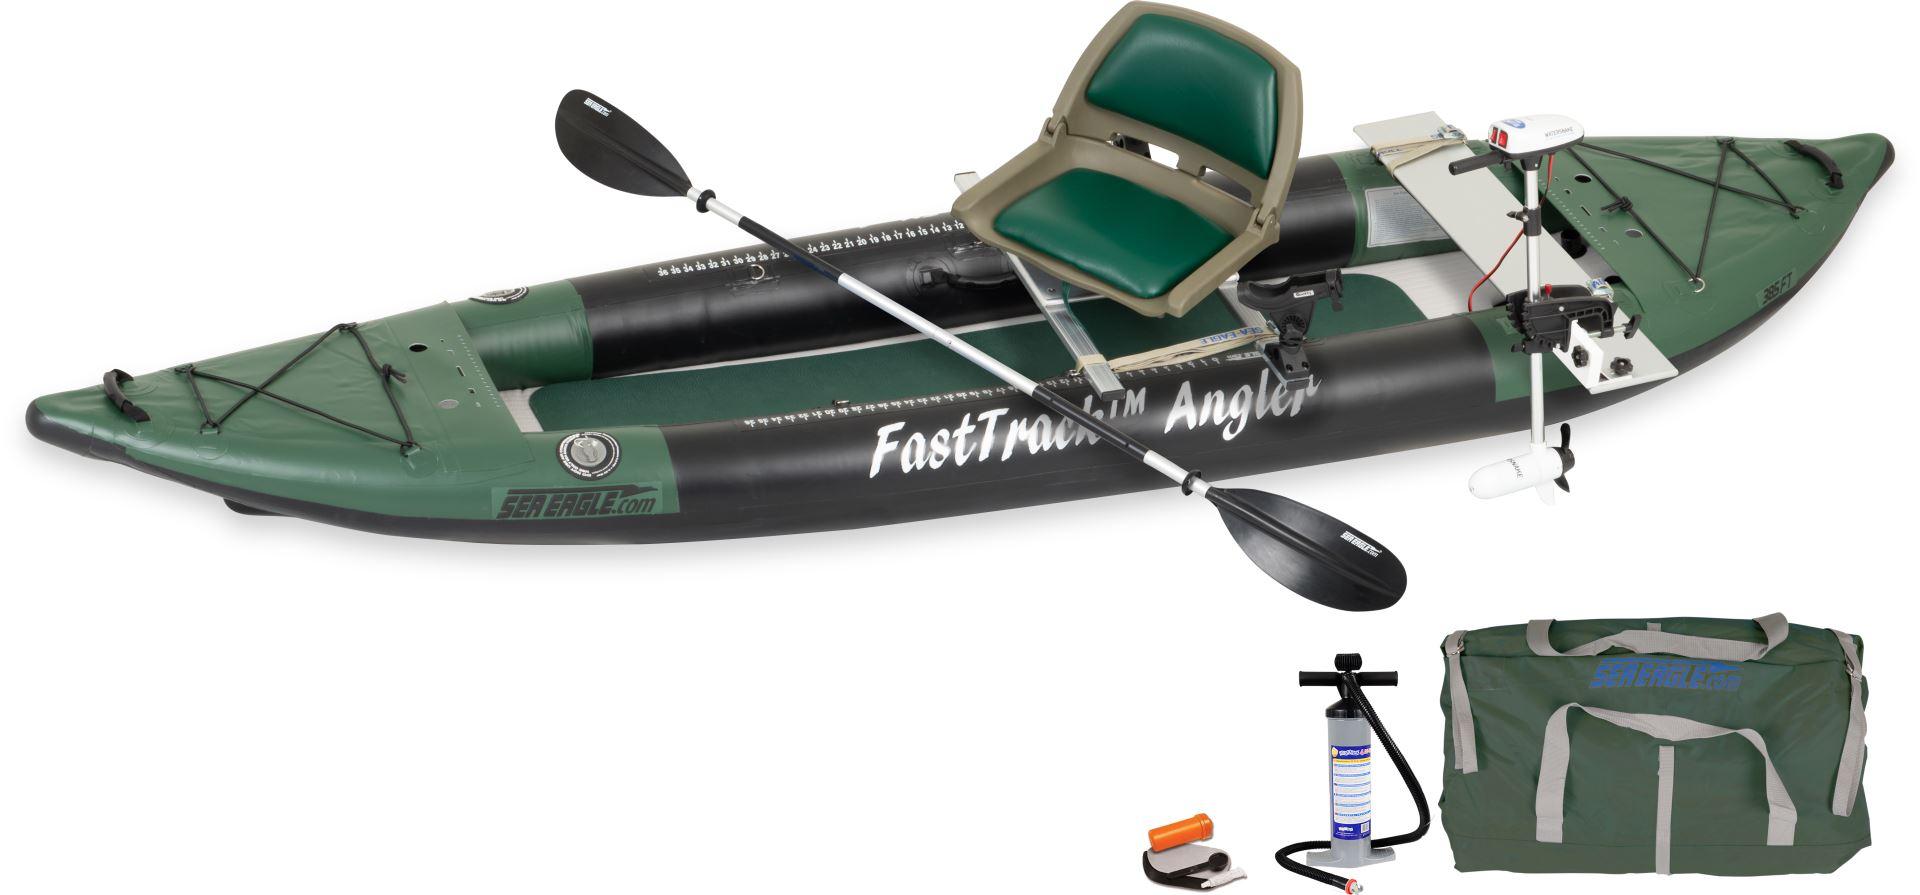 https://www.seaeagle.com/img/BoatPackage/XXL/385FTAK_PMFR.jpg